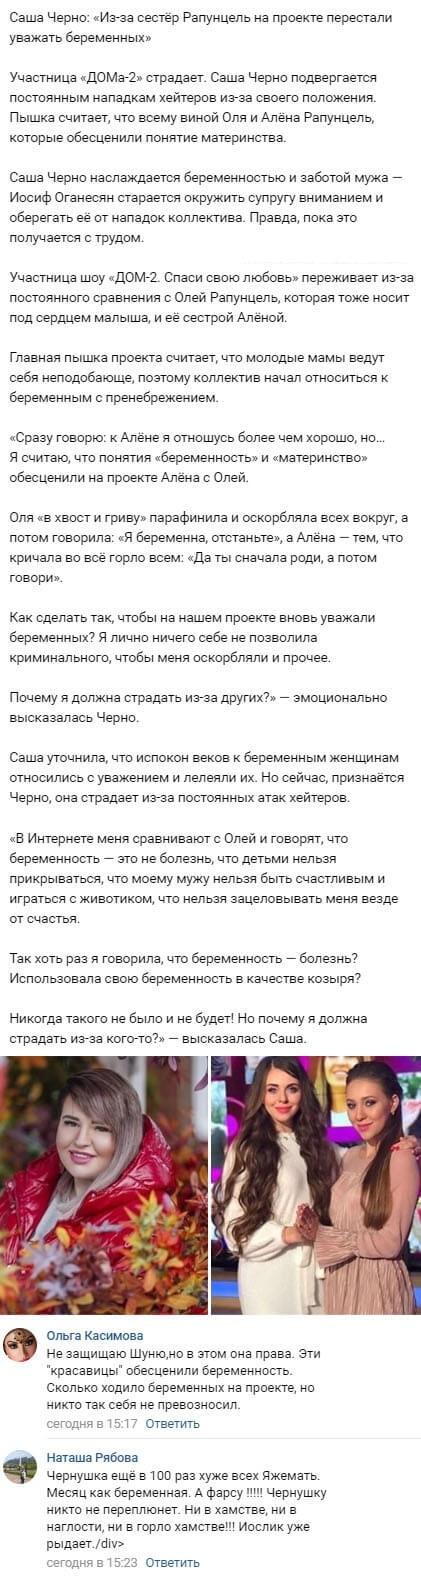 Александра Черно сделала крайними Ольгу Рапунцель и Алёну Савкину